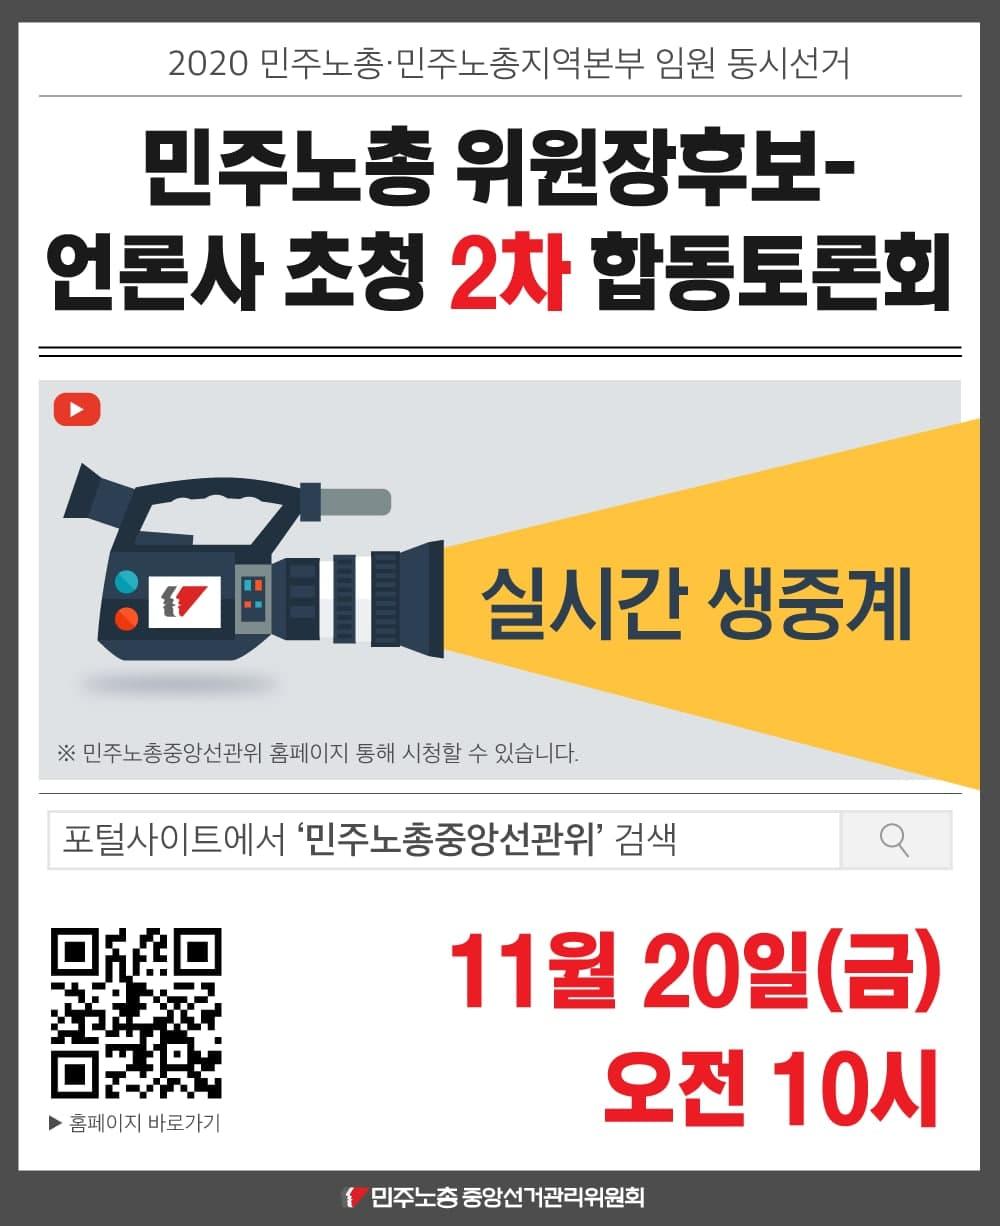 photo_2020-11-16_19-11-22.jpg